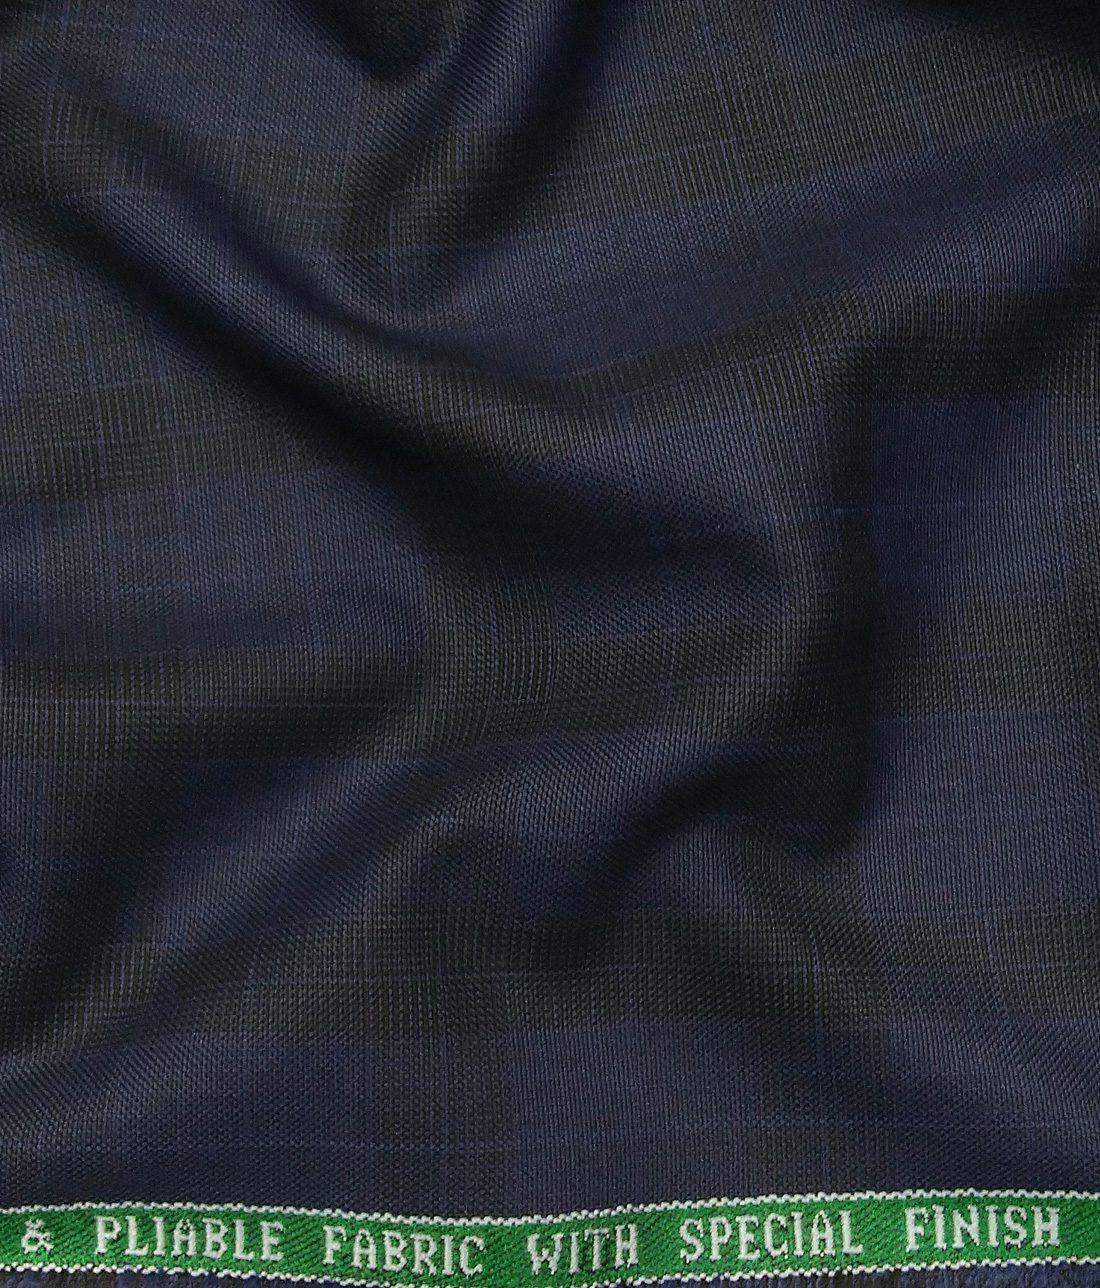 f21e26dc3 Raymond Dark Royal Blue Polyester Viscose Black Self Checks Unstitched  Suiting Fabric - 3.75 Meter